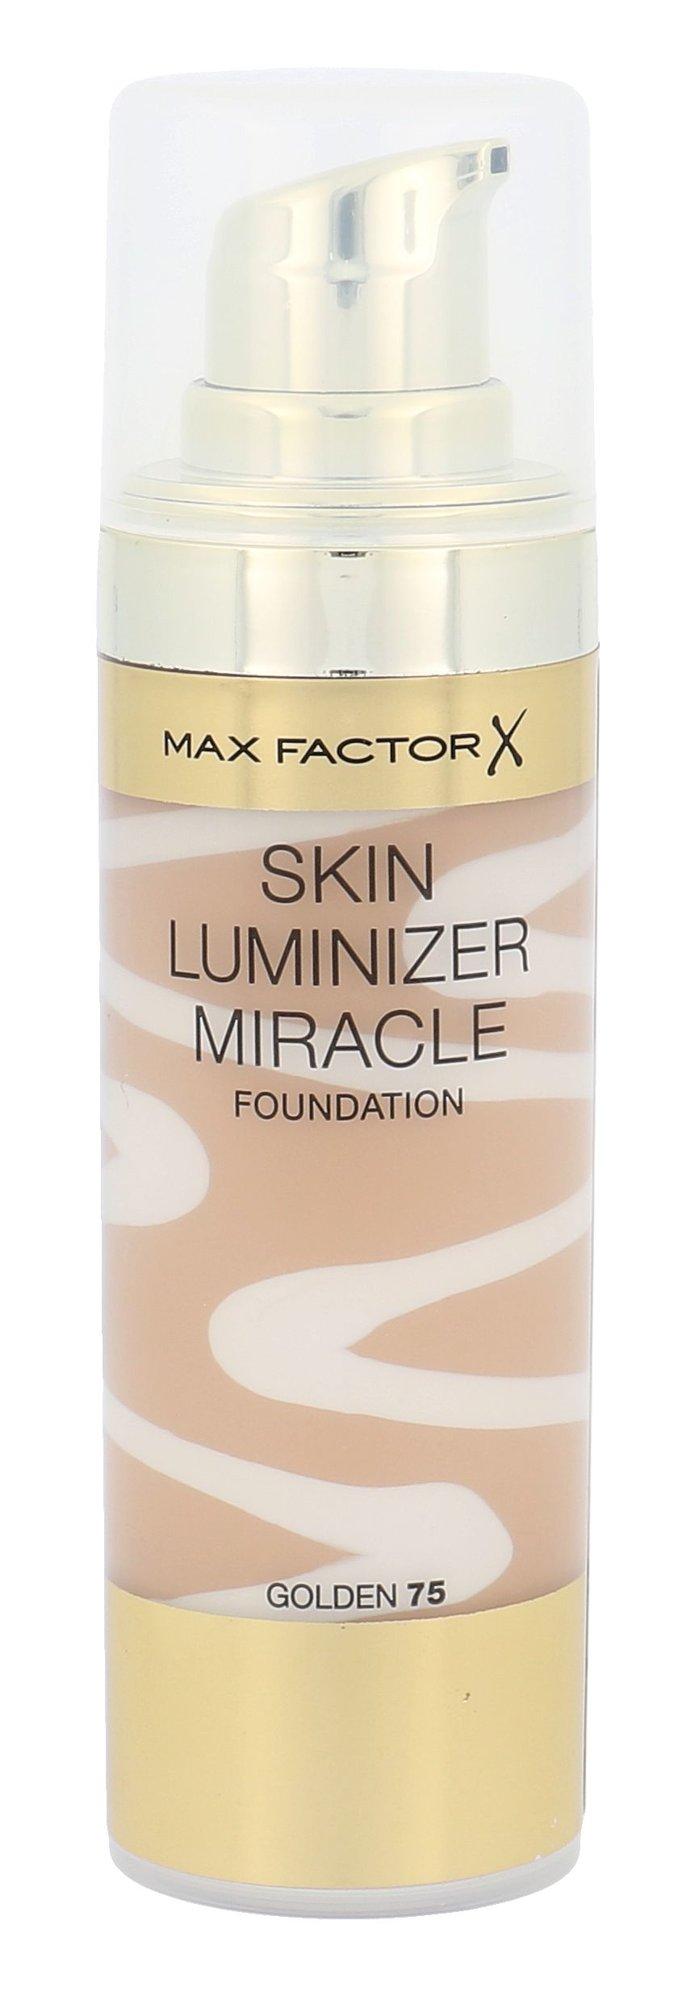 Max Factor Skin Luminizer Cosmetic 30ml 75 Golden